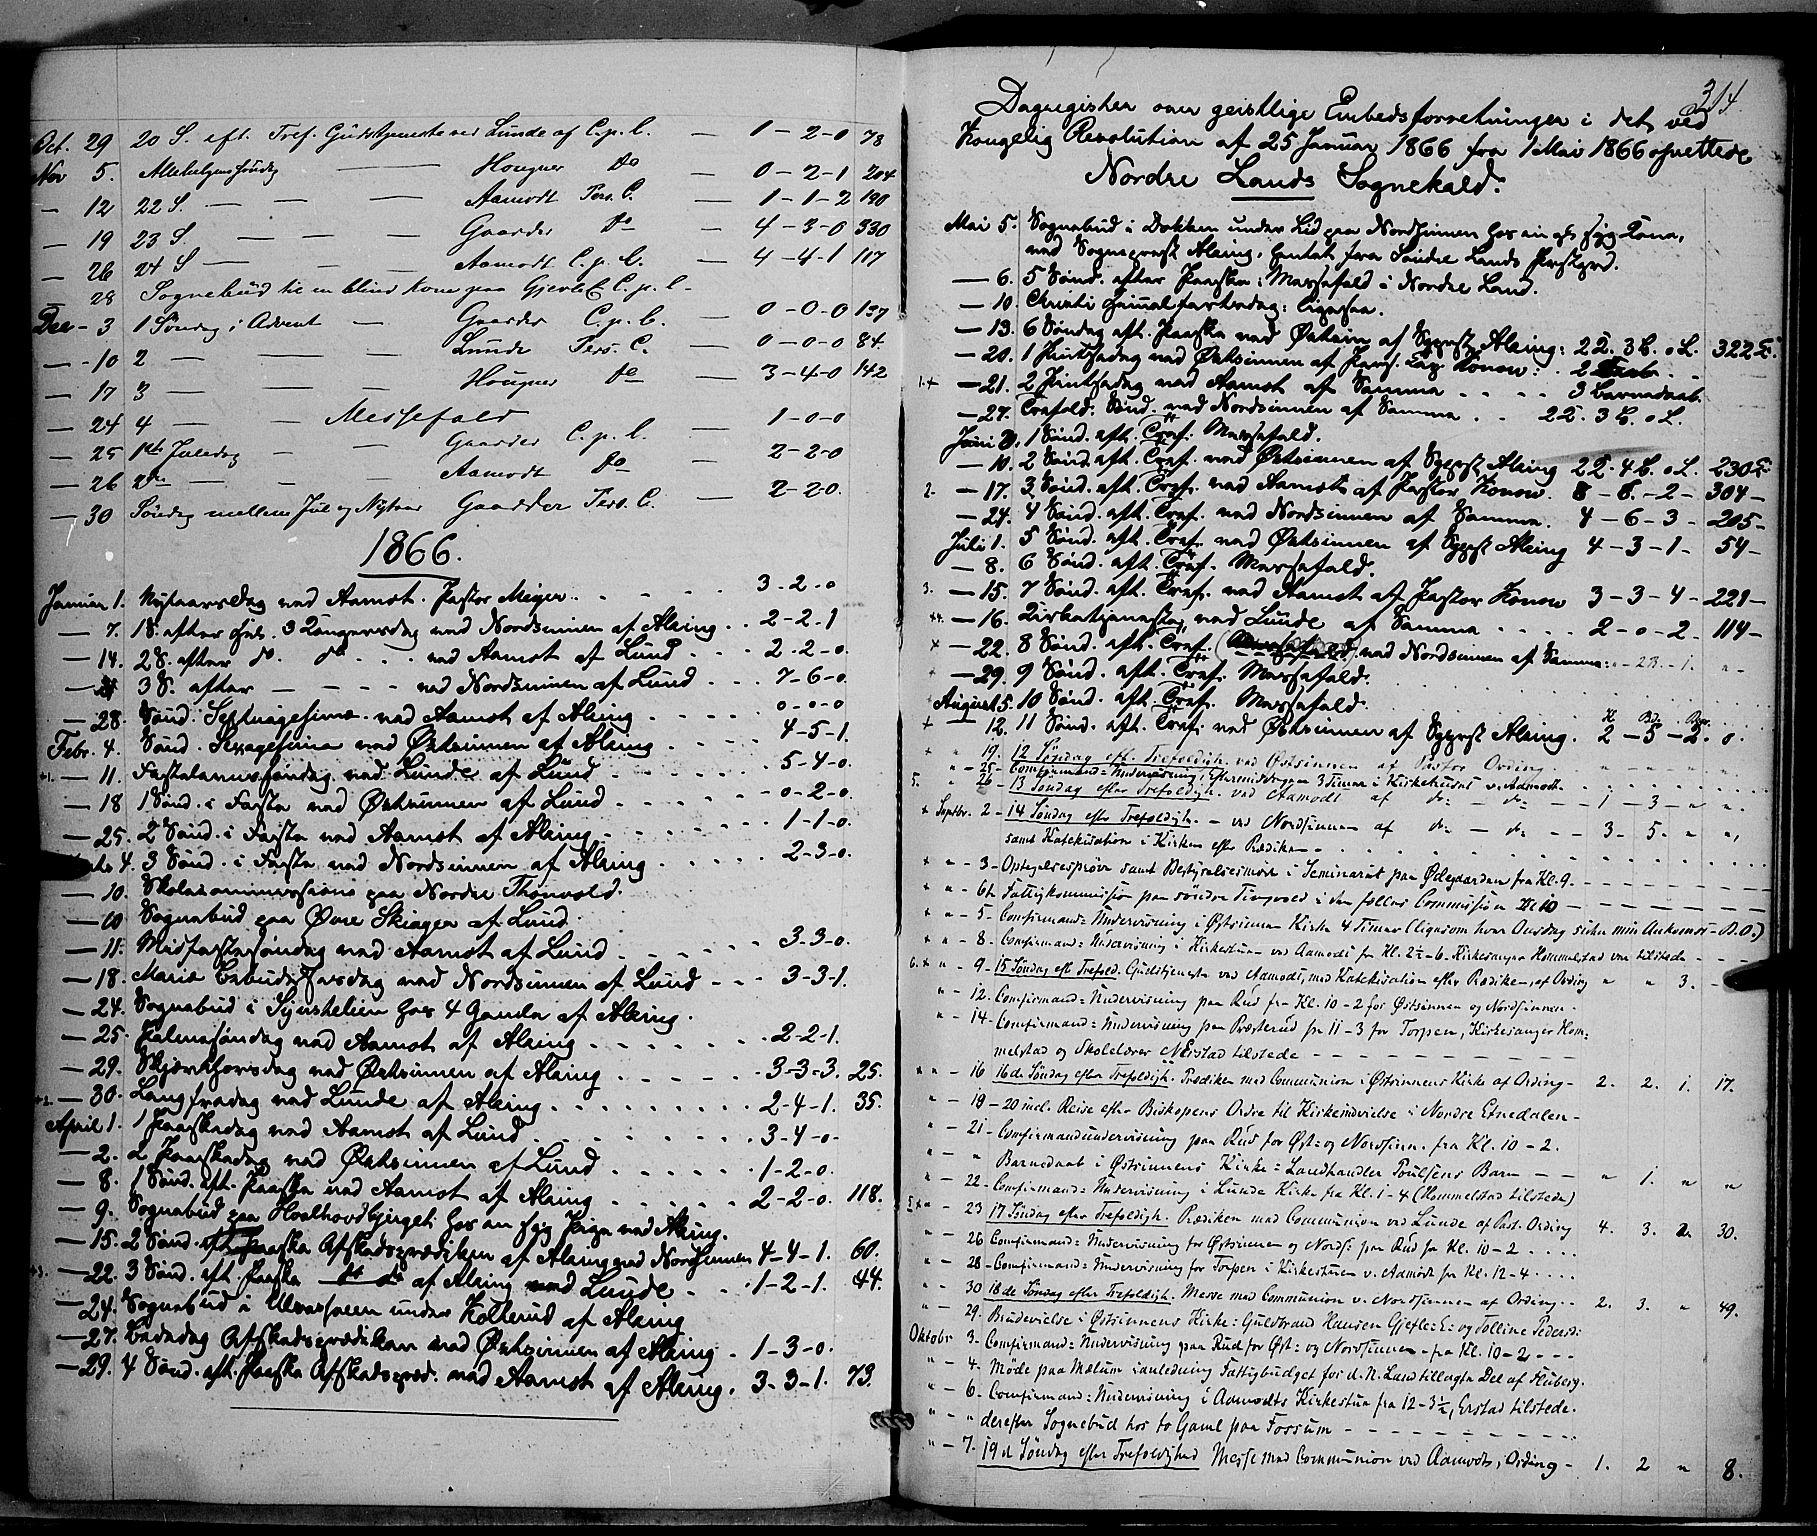 SAH, Nordre Land prestekontor, Ministerialbok nr. 1, 1860-1871, s. 314